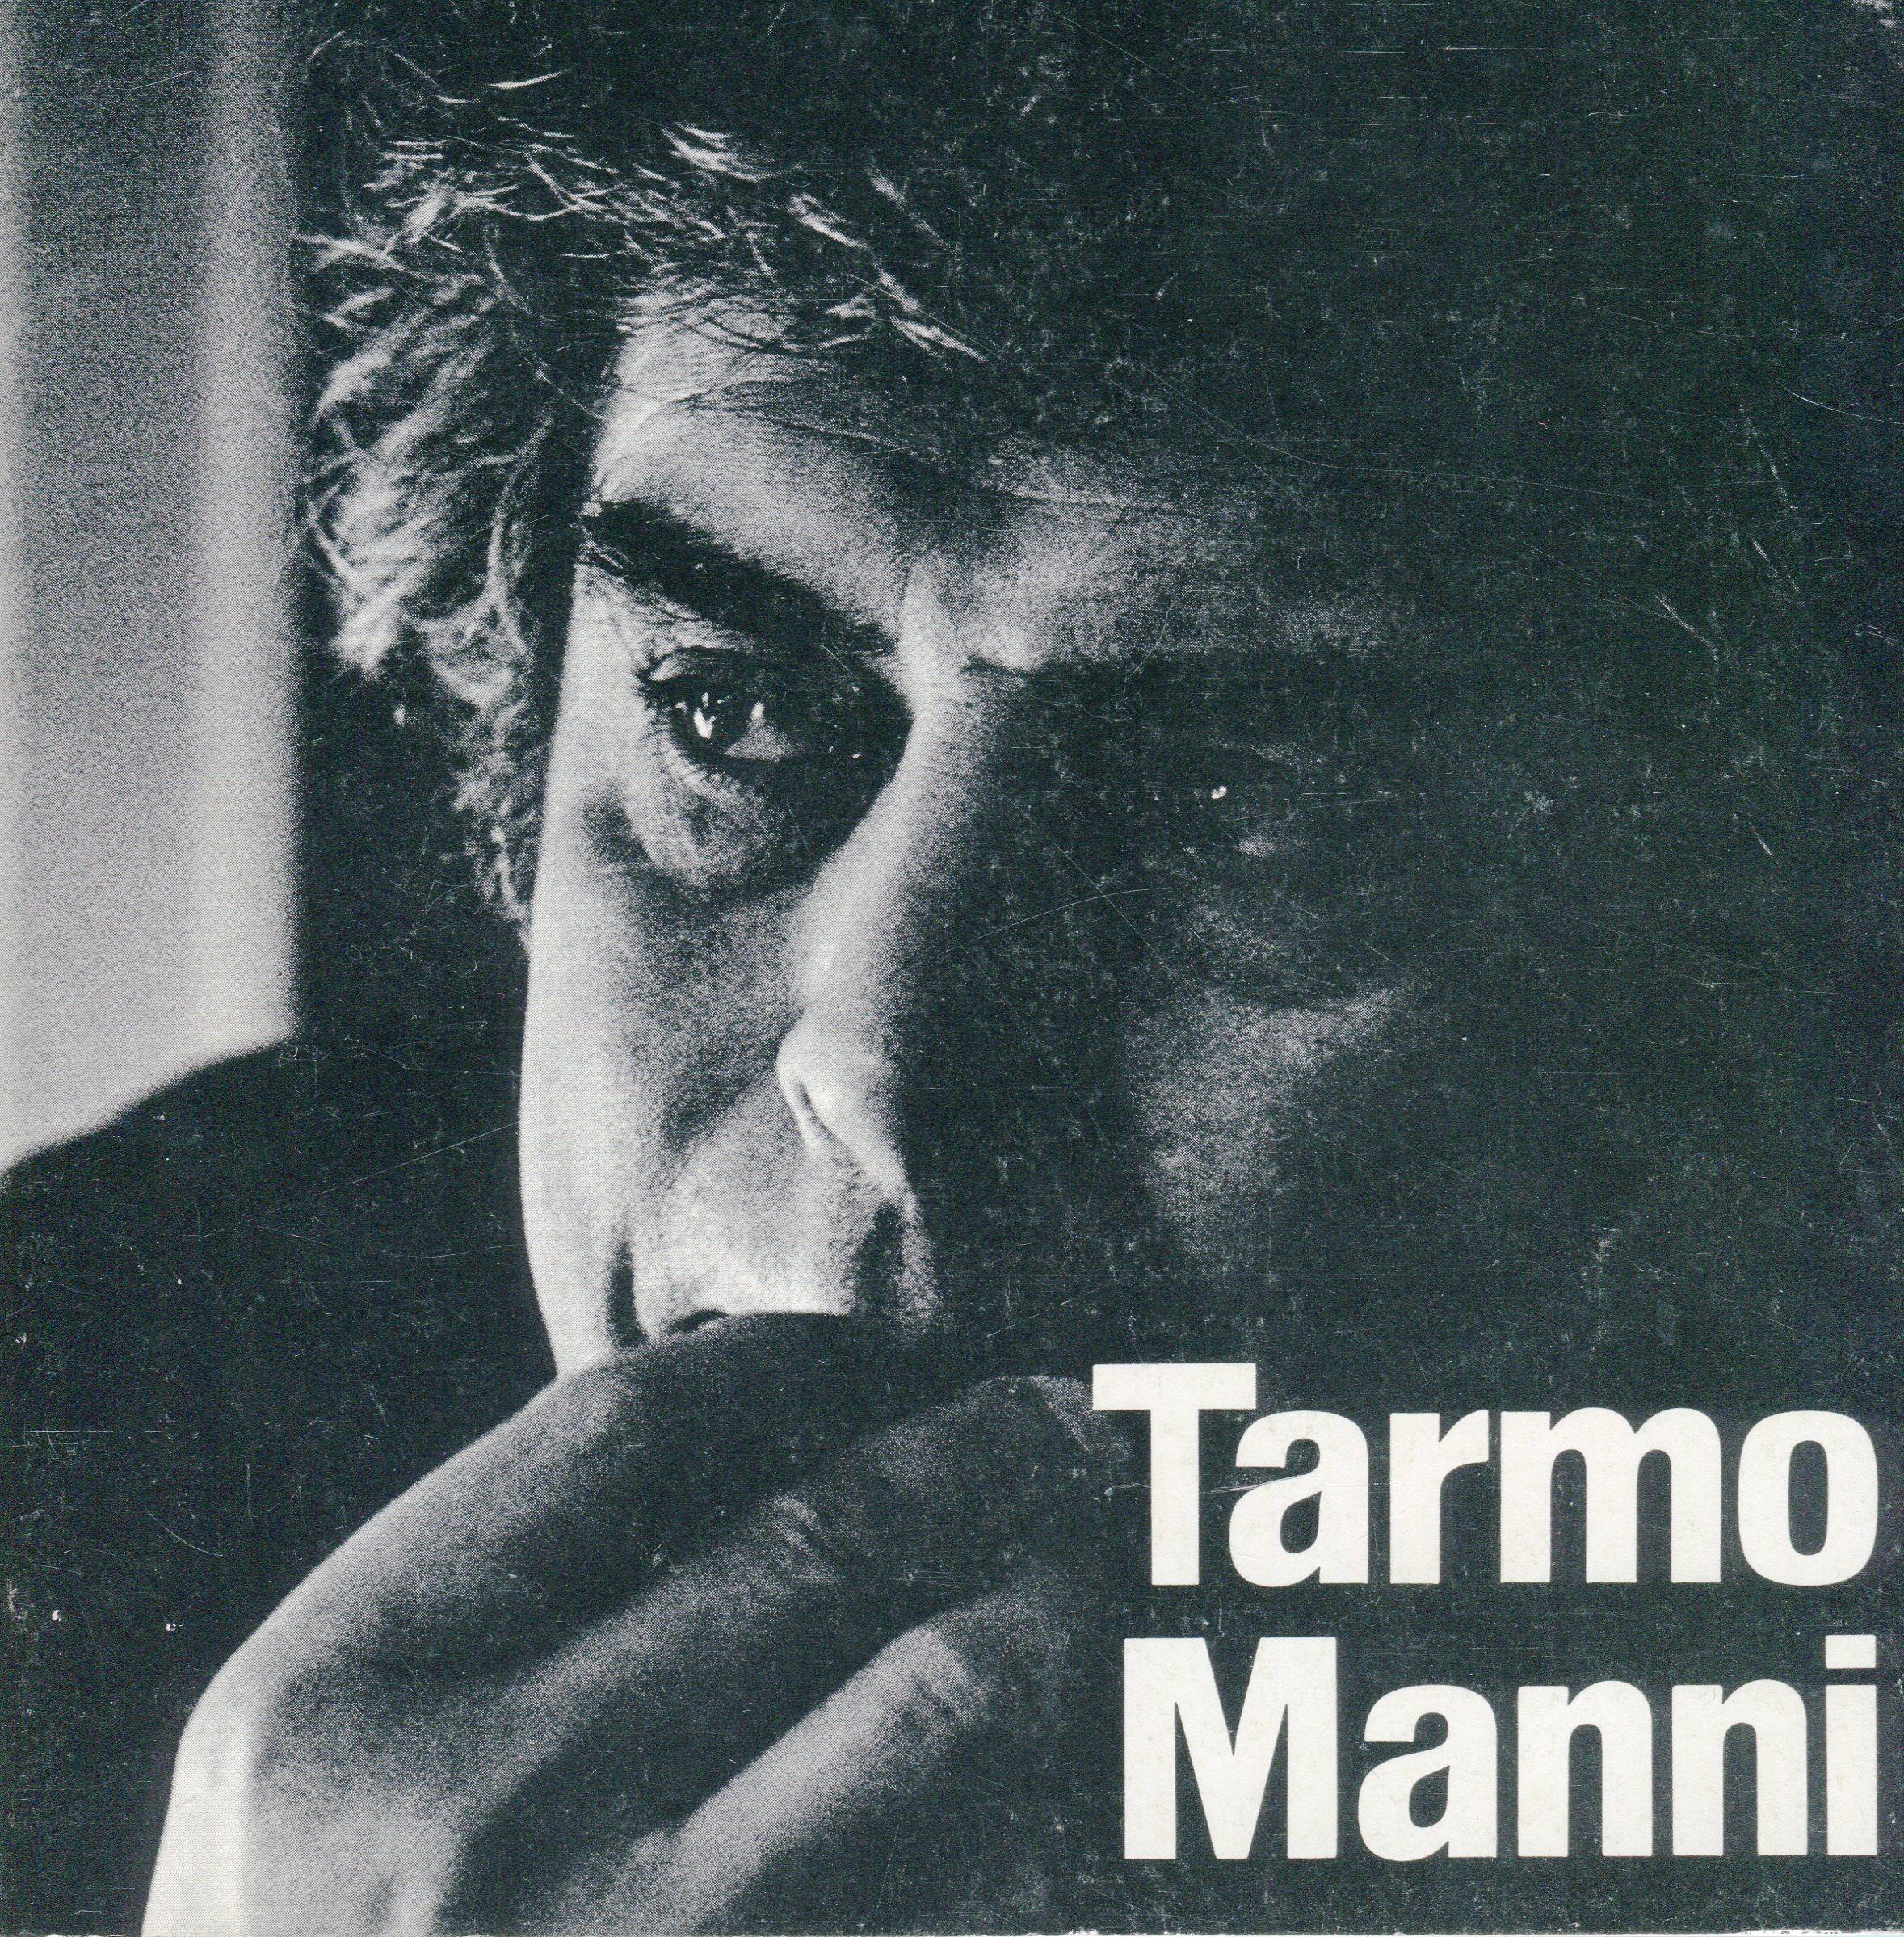 Tarmo Manni056